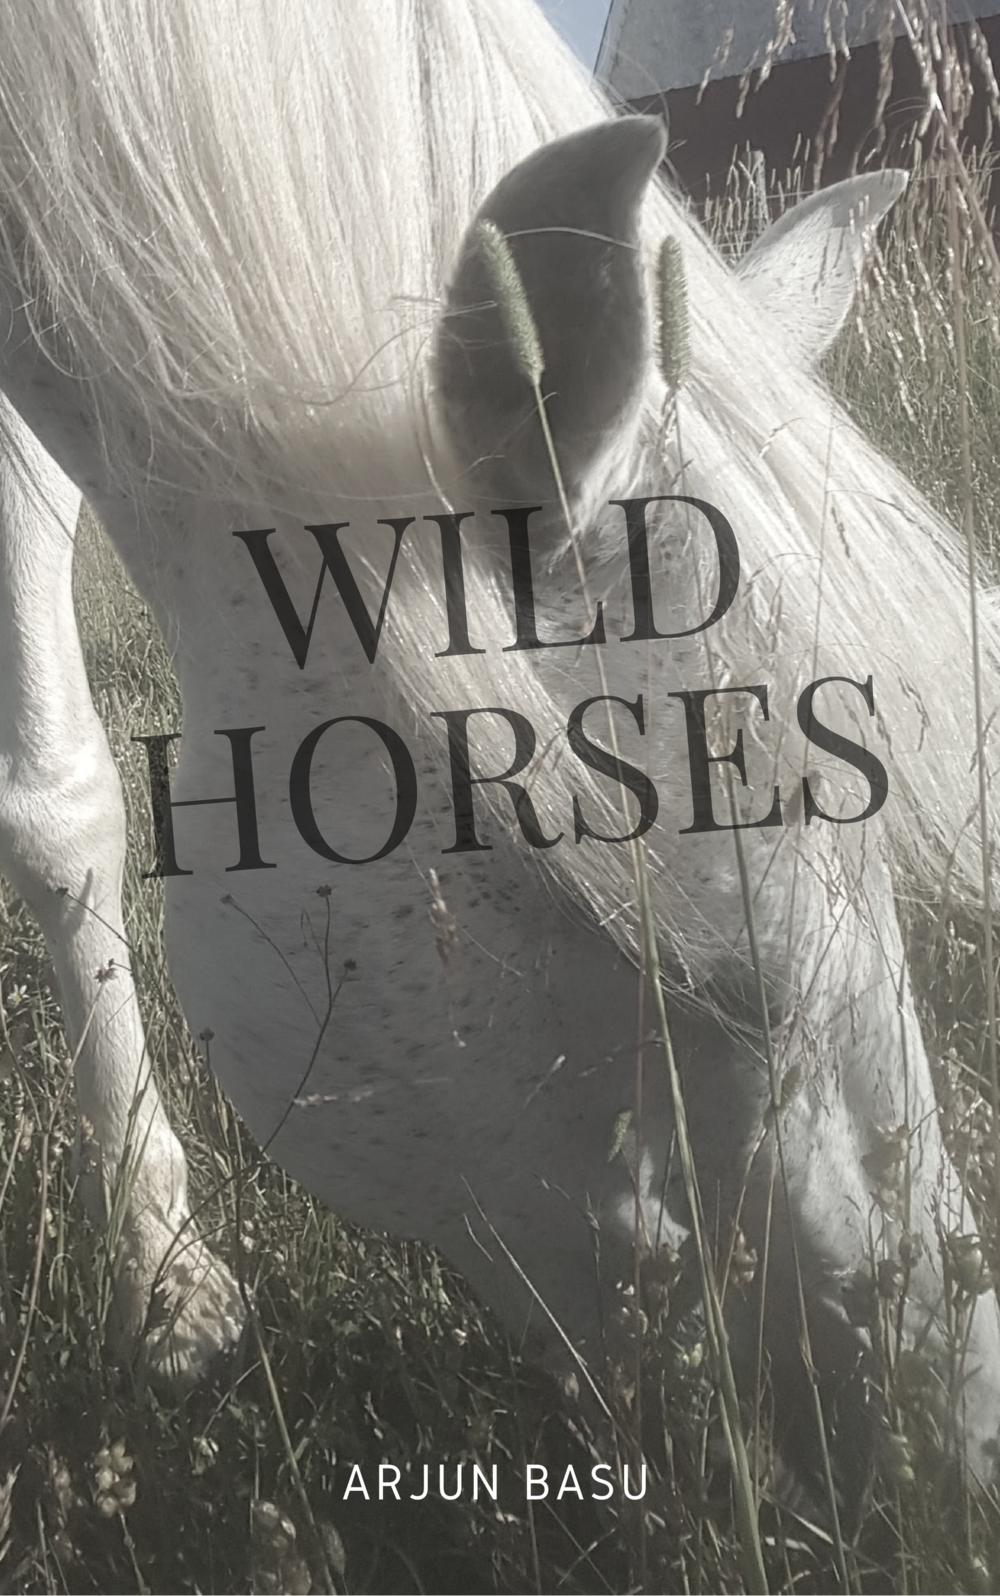 Wild Hor ses by Arjun Basu